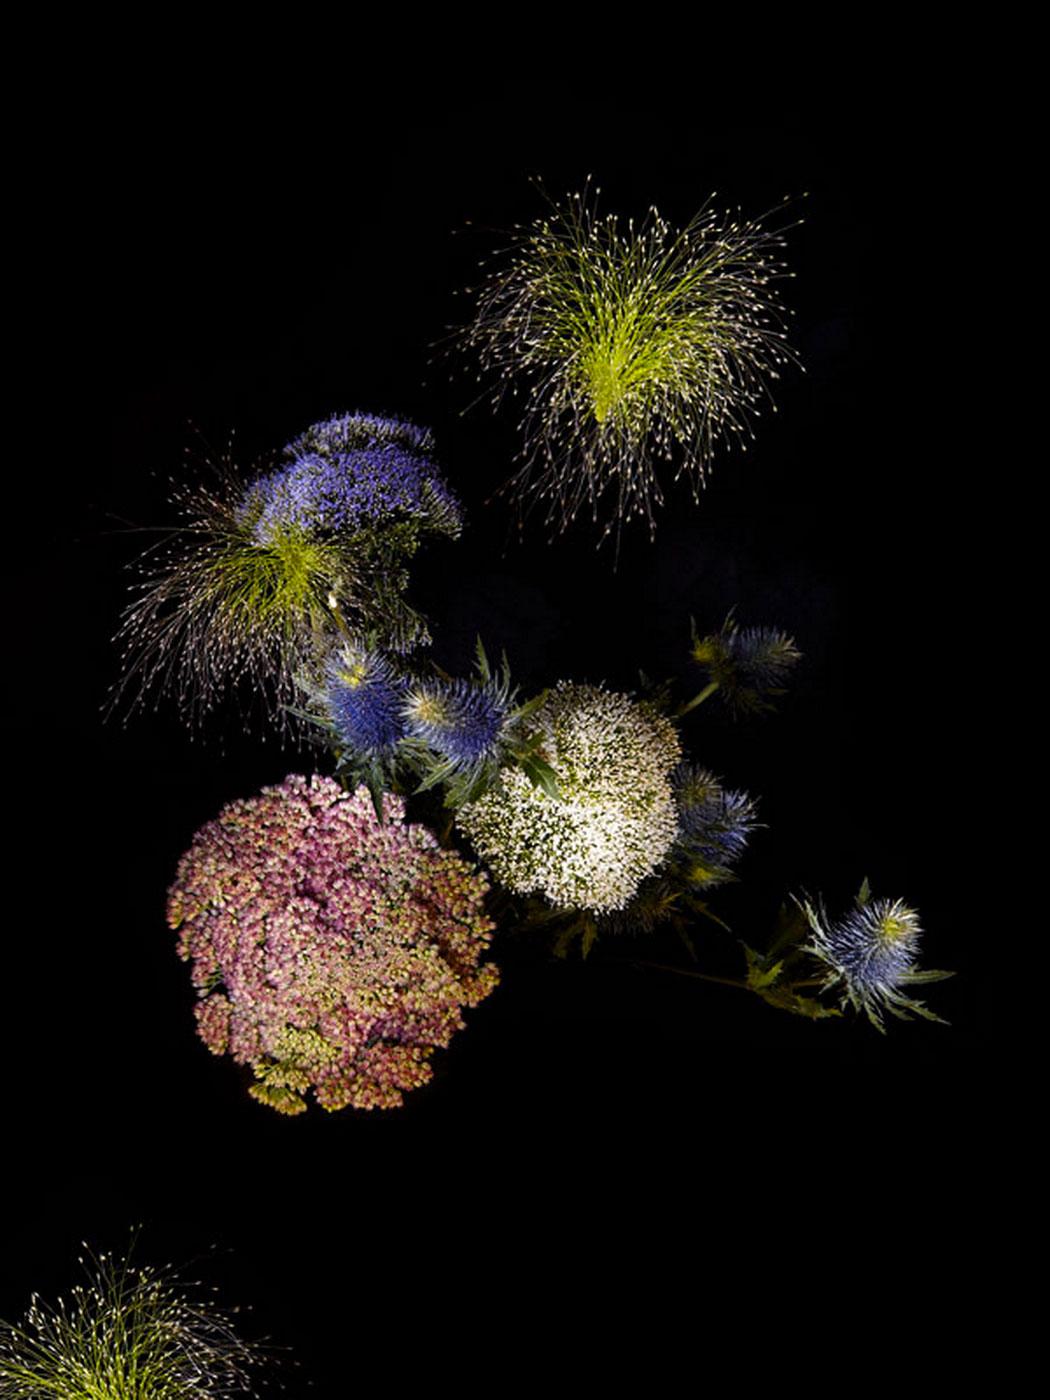 sarah-illenberger-flowerwork-01.jpg